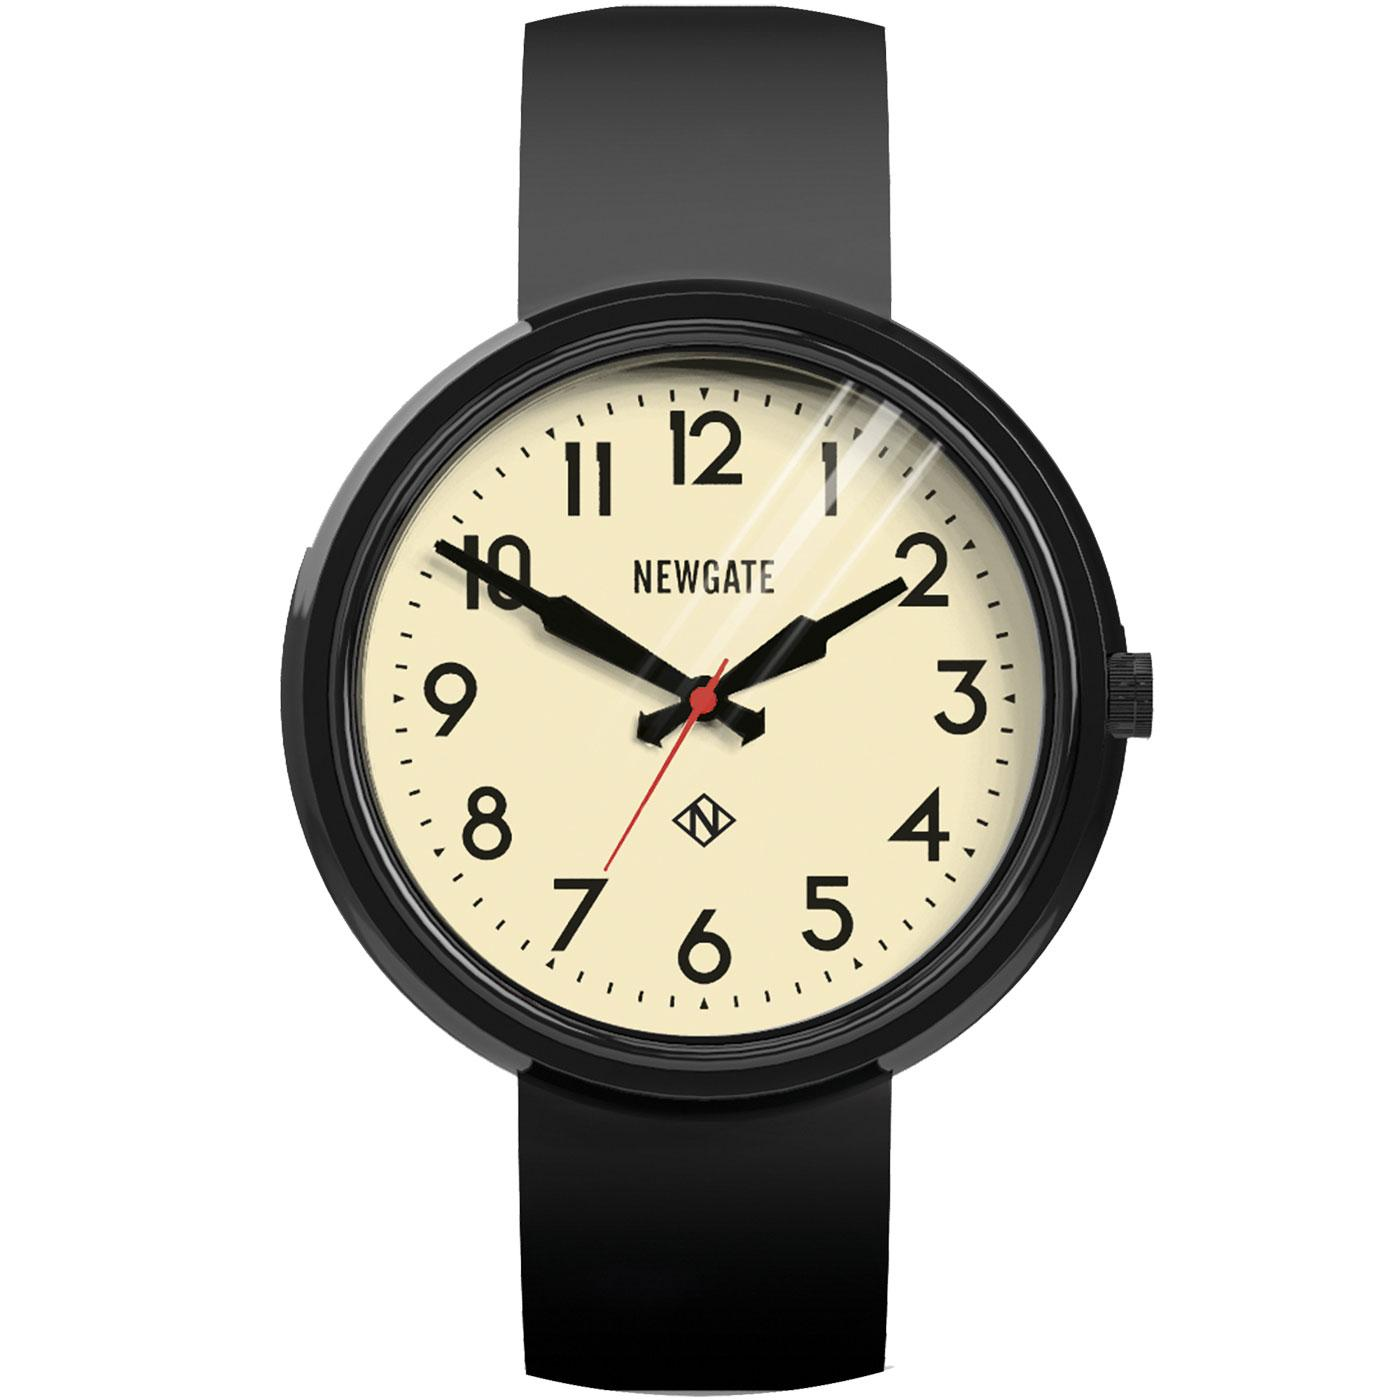 The Electric Grand NEWGATE CLOCKS Retro Watch B